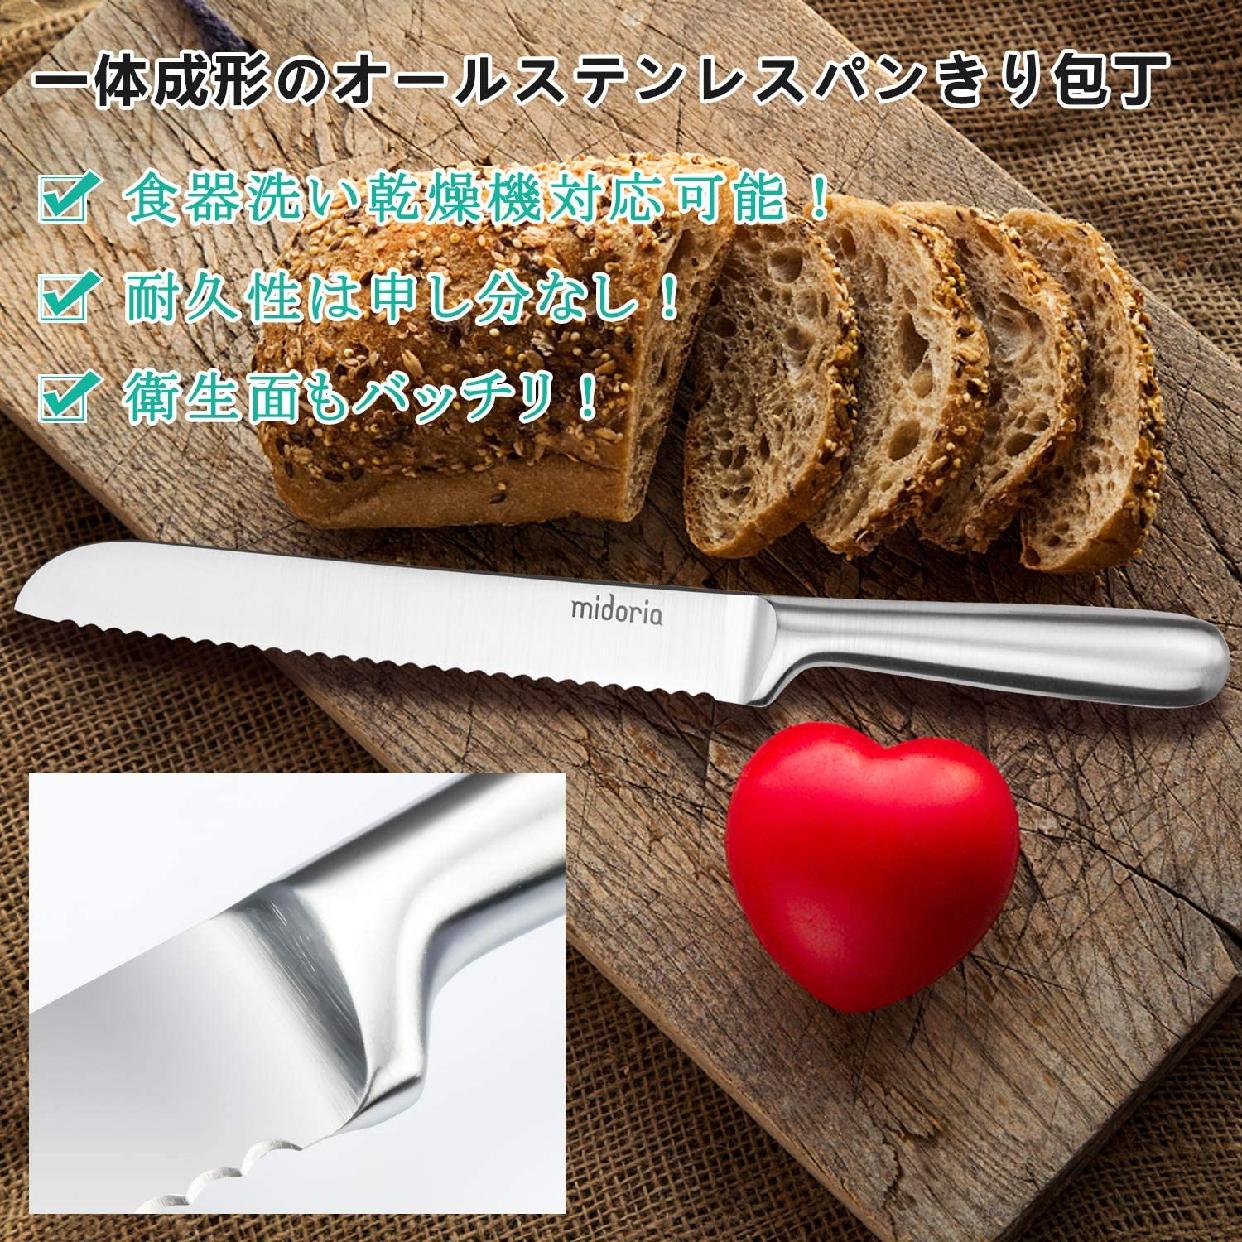 MIDORIA(ミドリア) パン切りナイフ シルバーの商品画像5